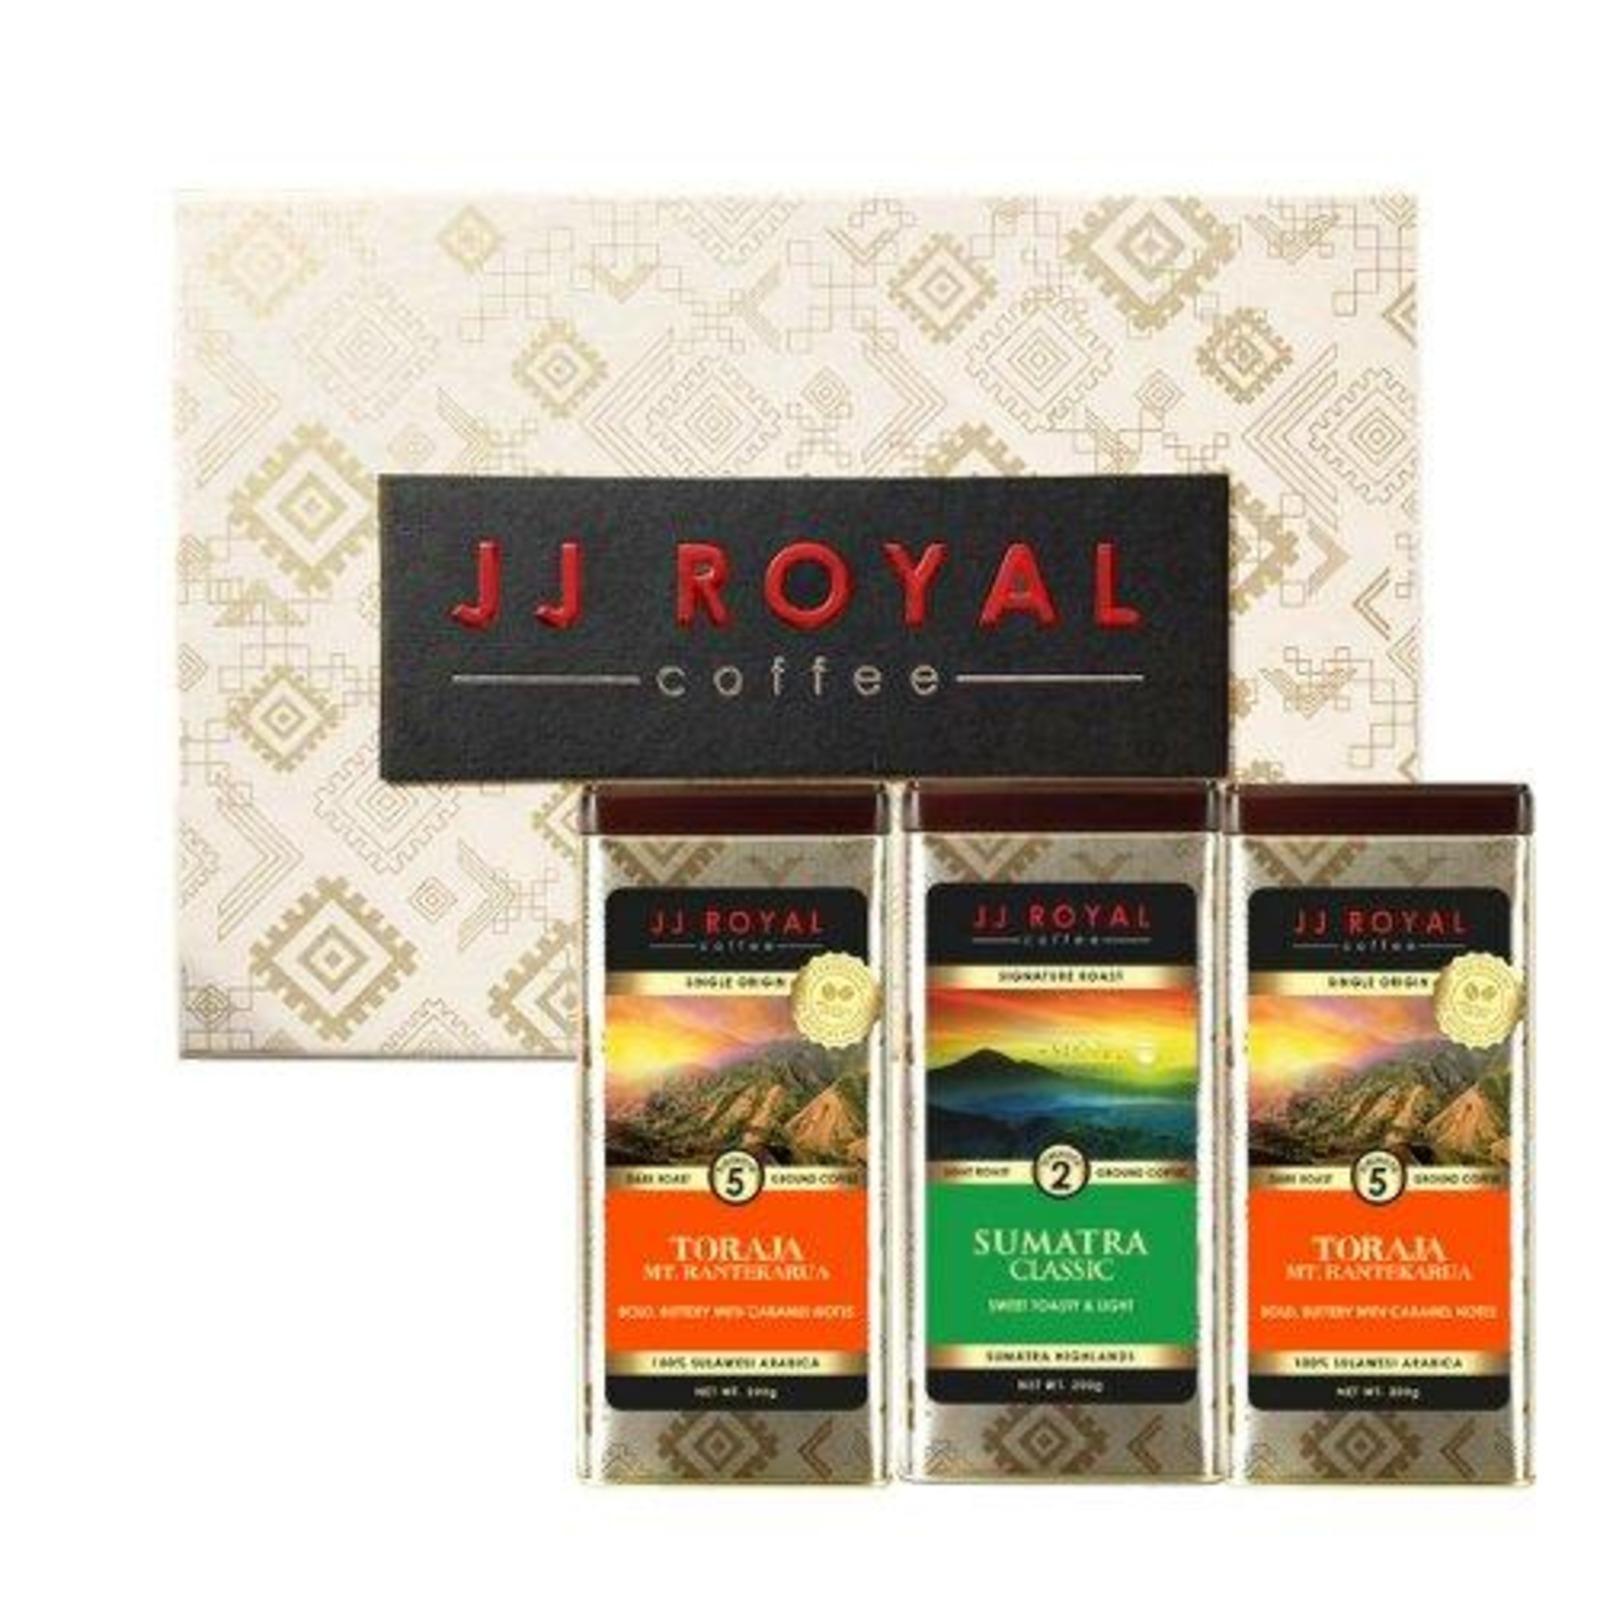 JJ Royal Coffee - Toraja Ground Coffee Set & Free Gift Bag